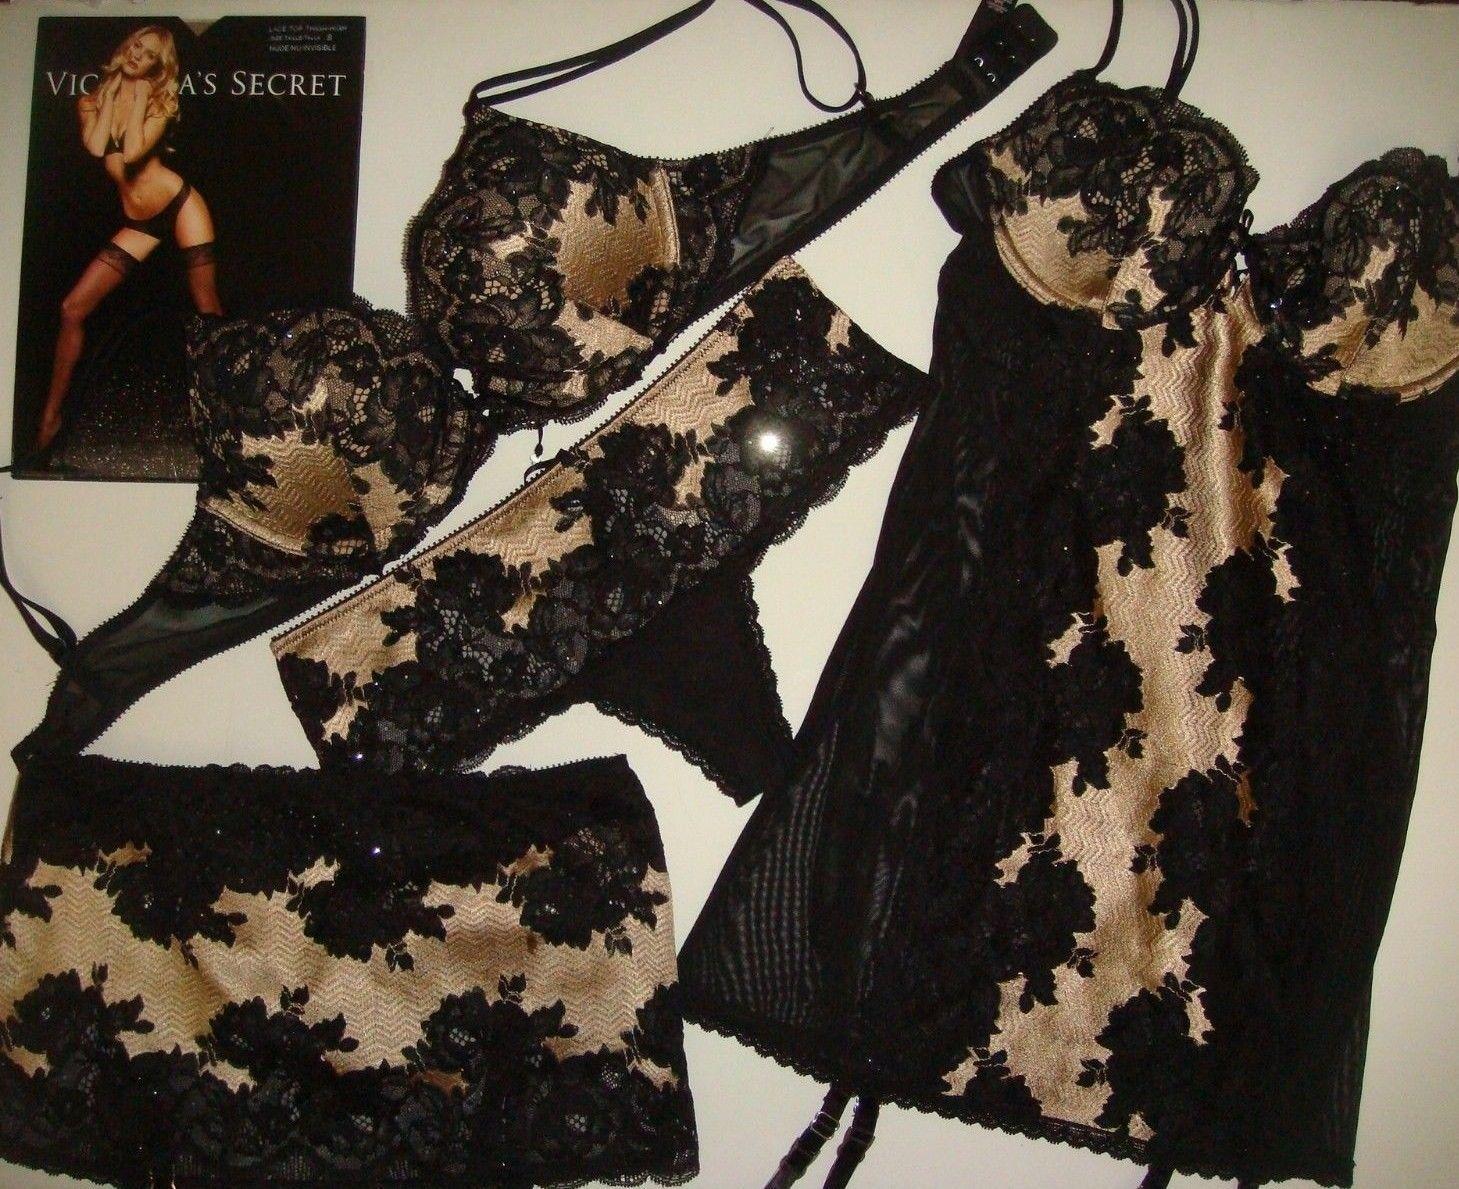 07a0d4d7cd S l1600. S l1600. Previous. NWT Victoria s Secret 34B BRA SET+GARTER SLIP  Sexy Seduction Black ...